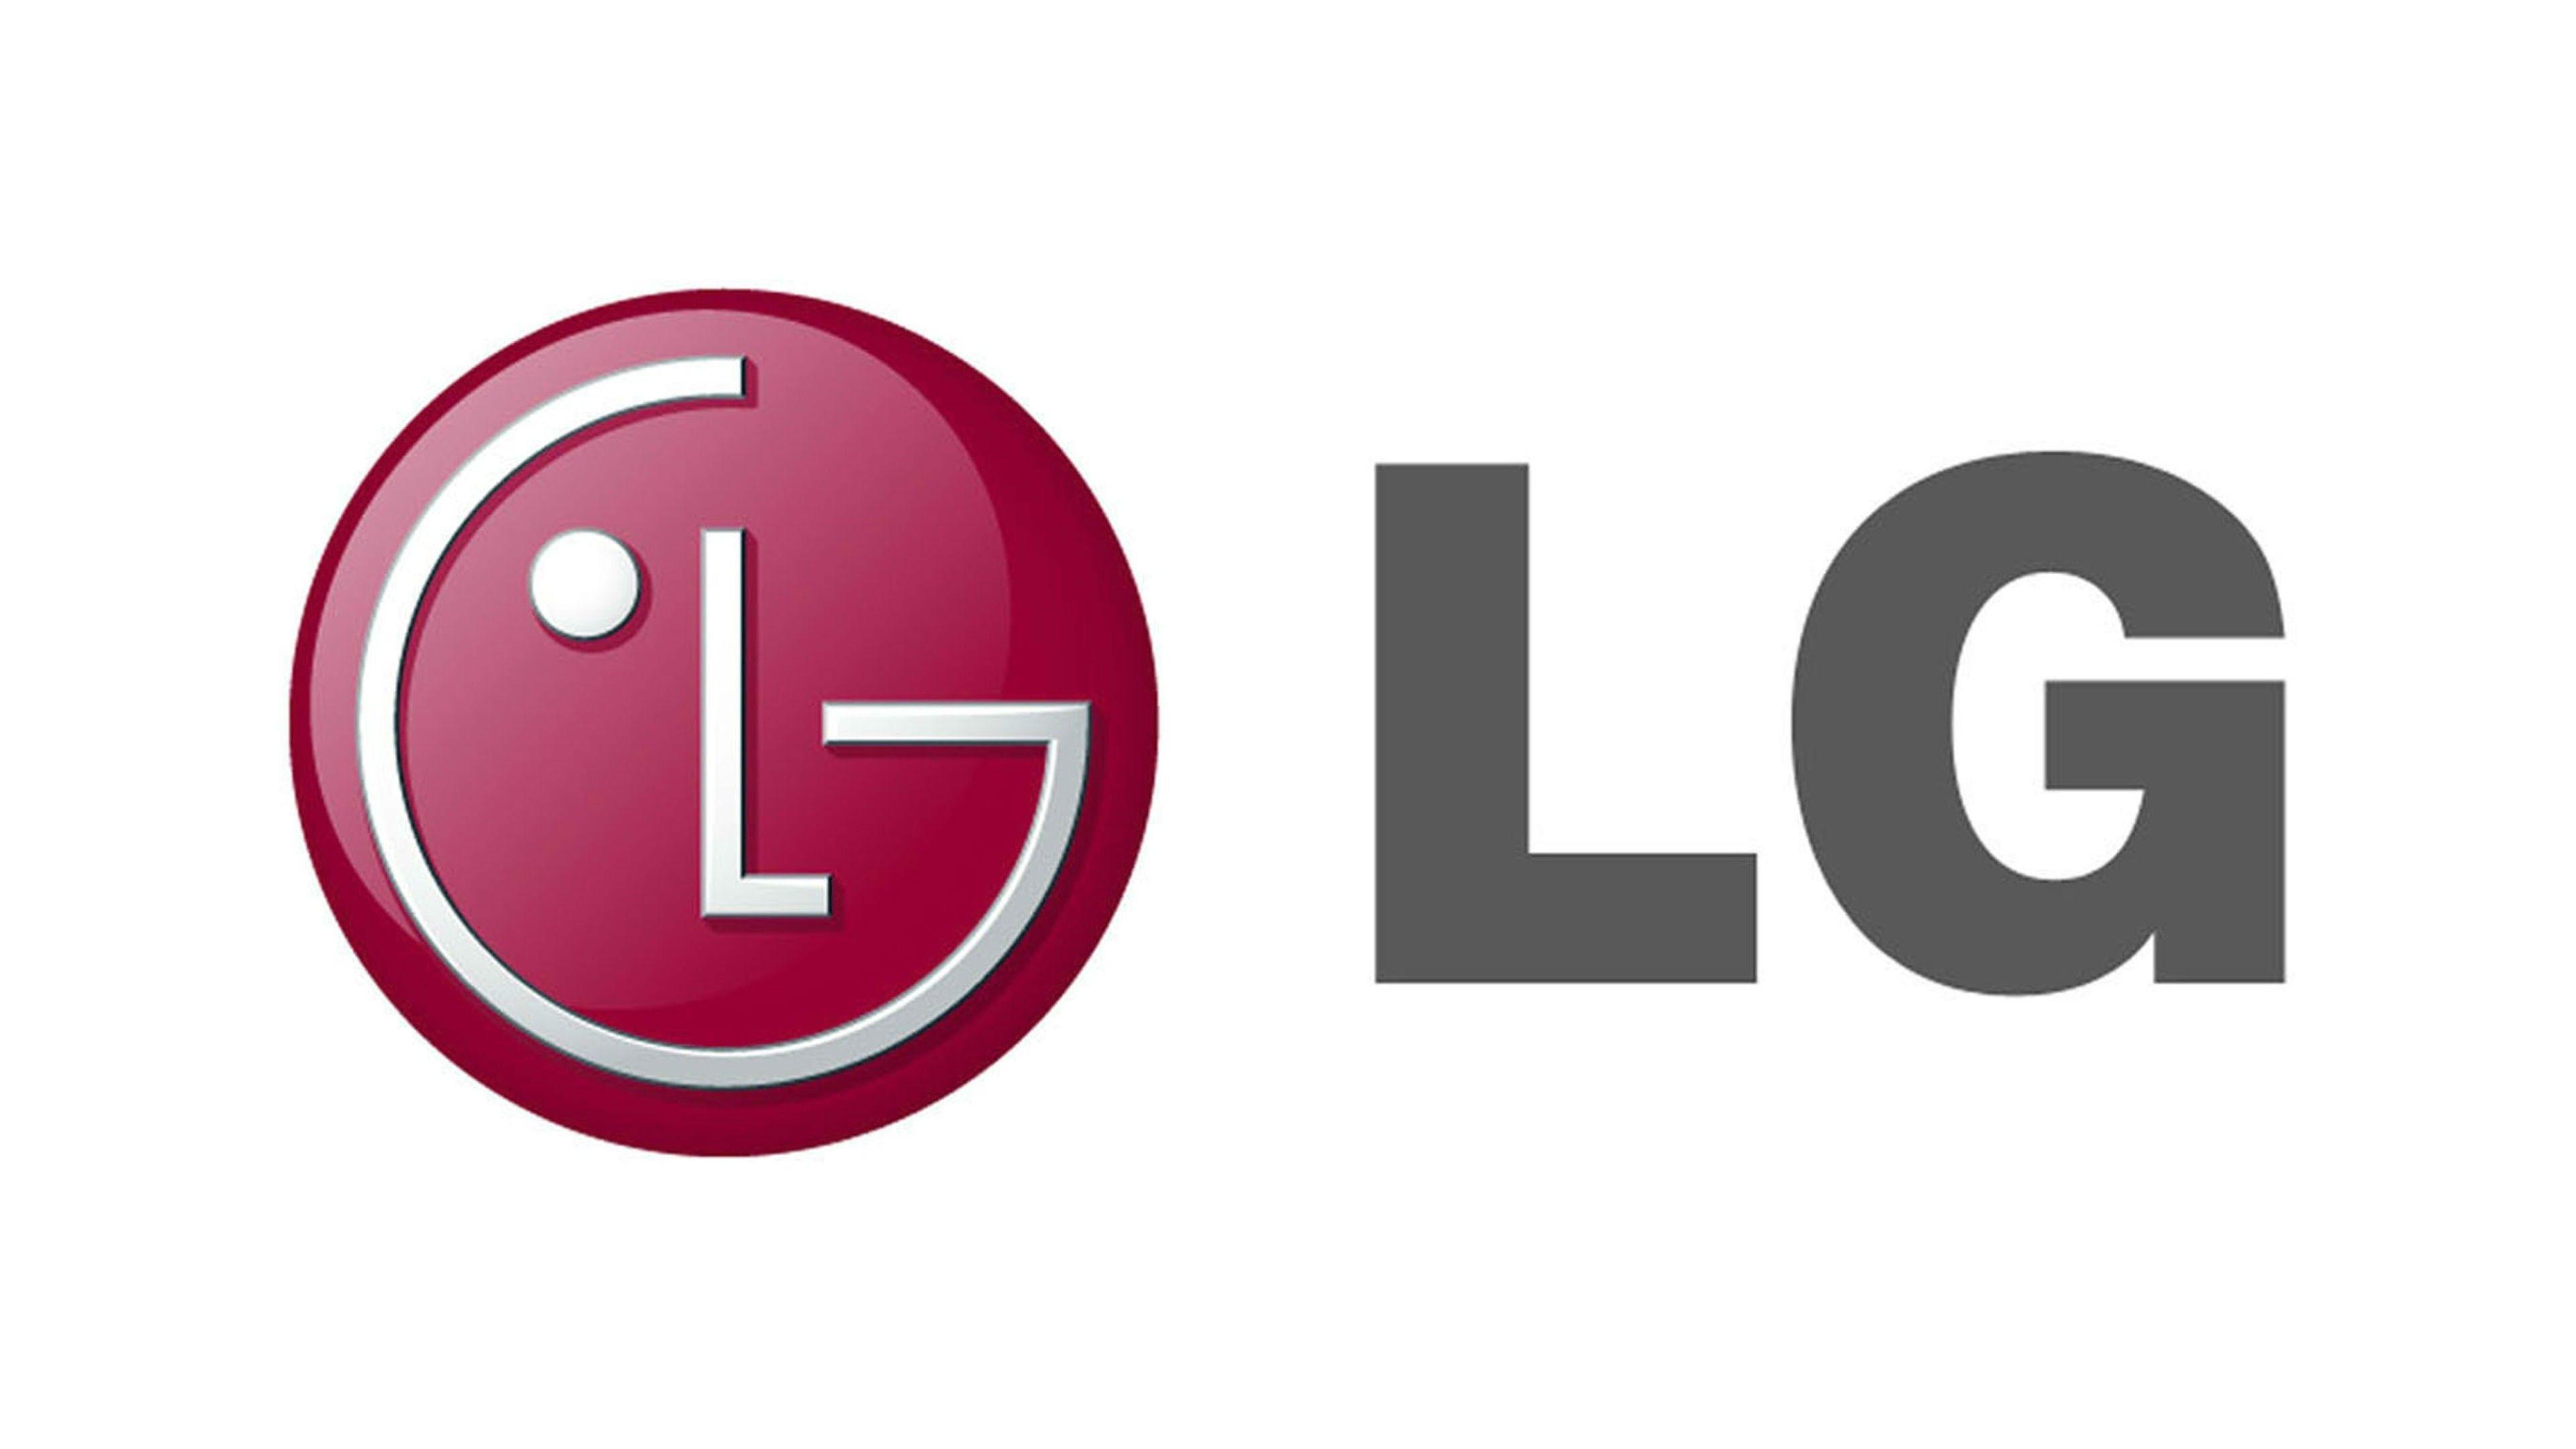 LG Logo Wallpapers - Wallpaper Cave